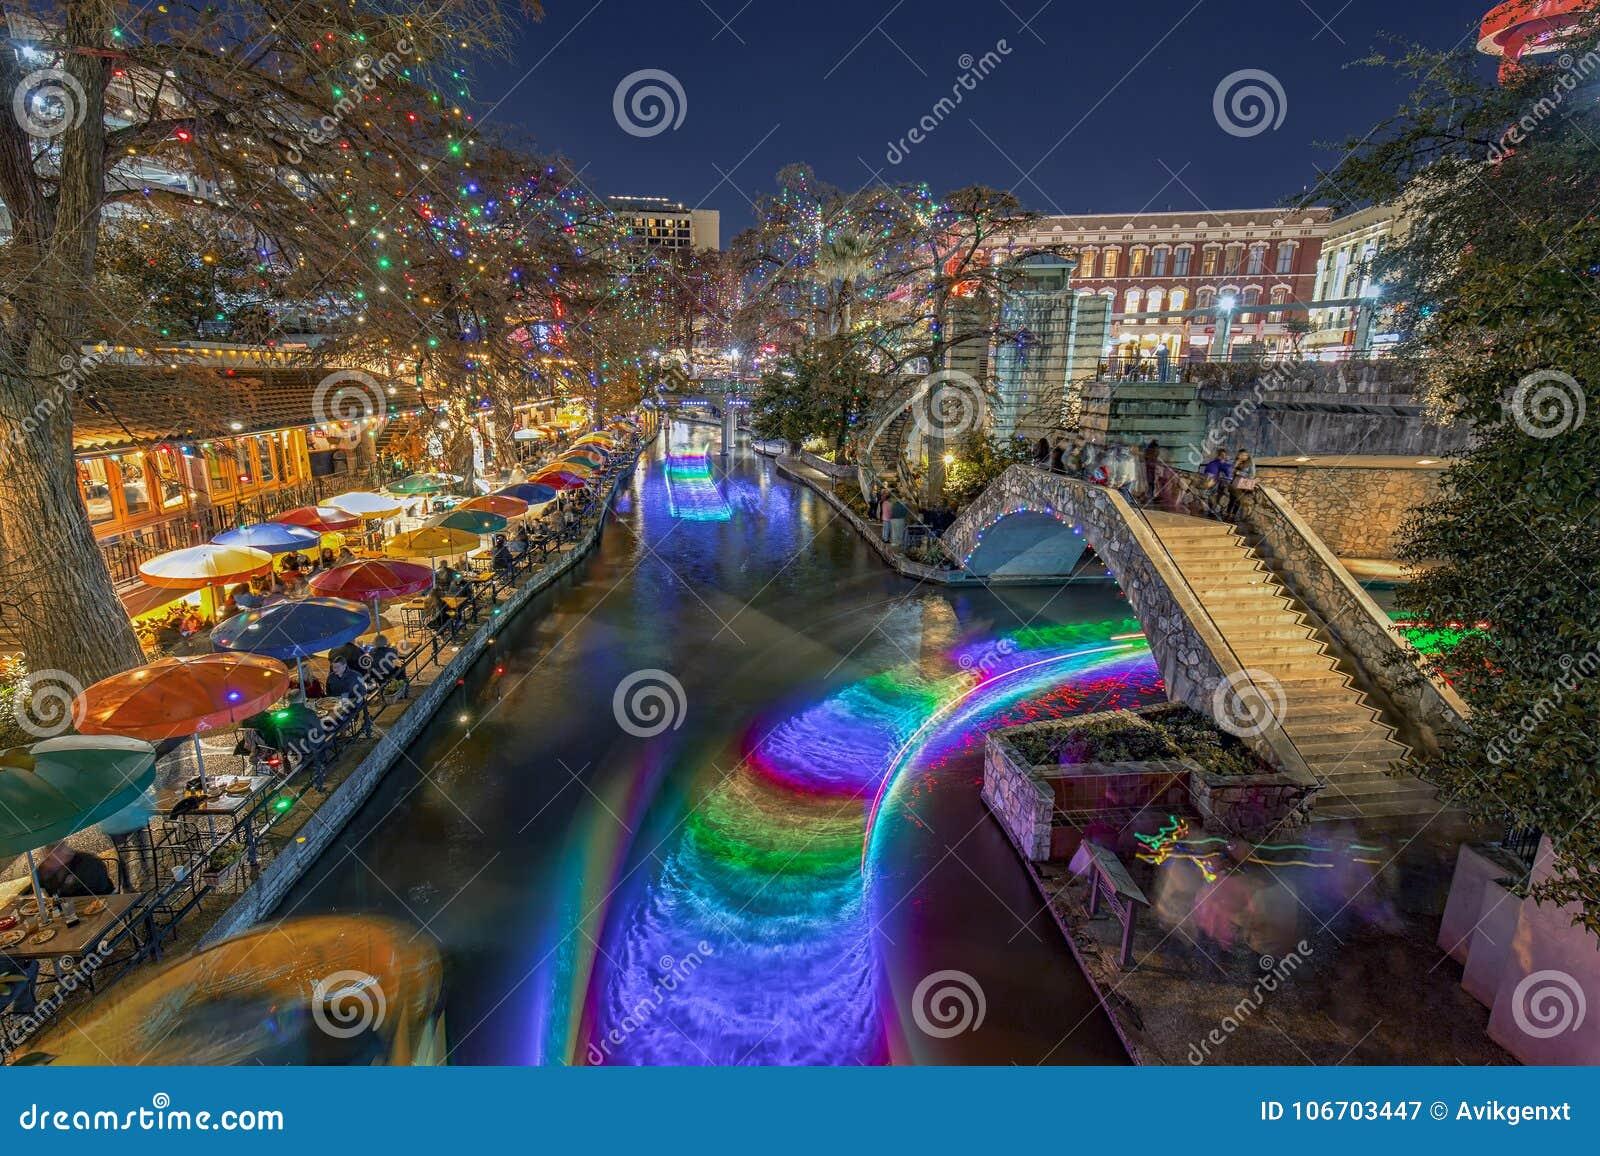 San Antonio Riverwalk During Christmas.San Antonio River Walk With Christmas Lights In Texas Usa